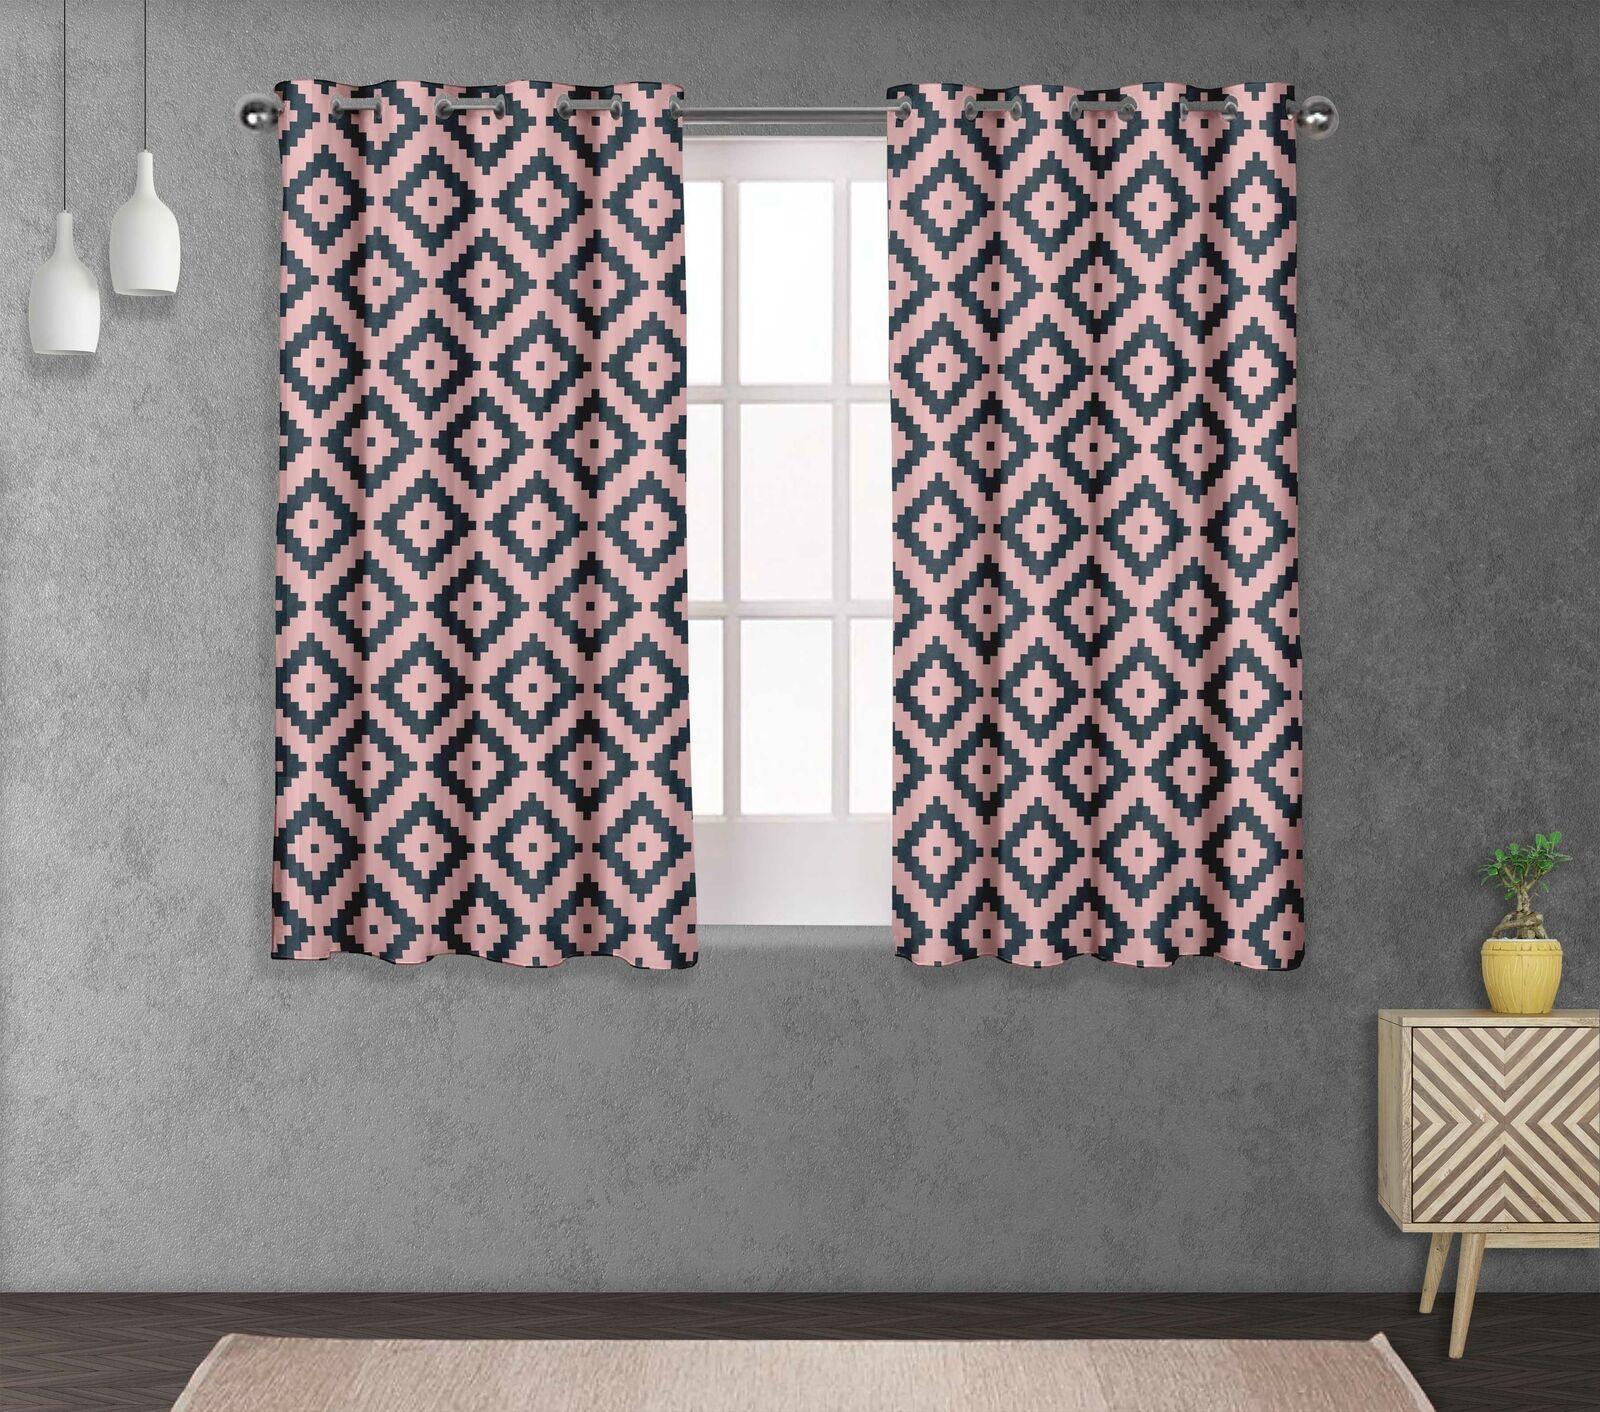 S4sassy Square Printed Eyelet short & long Window Panel Curtains -GMD-515J